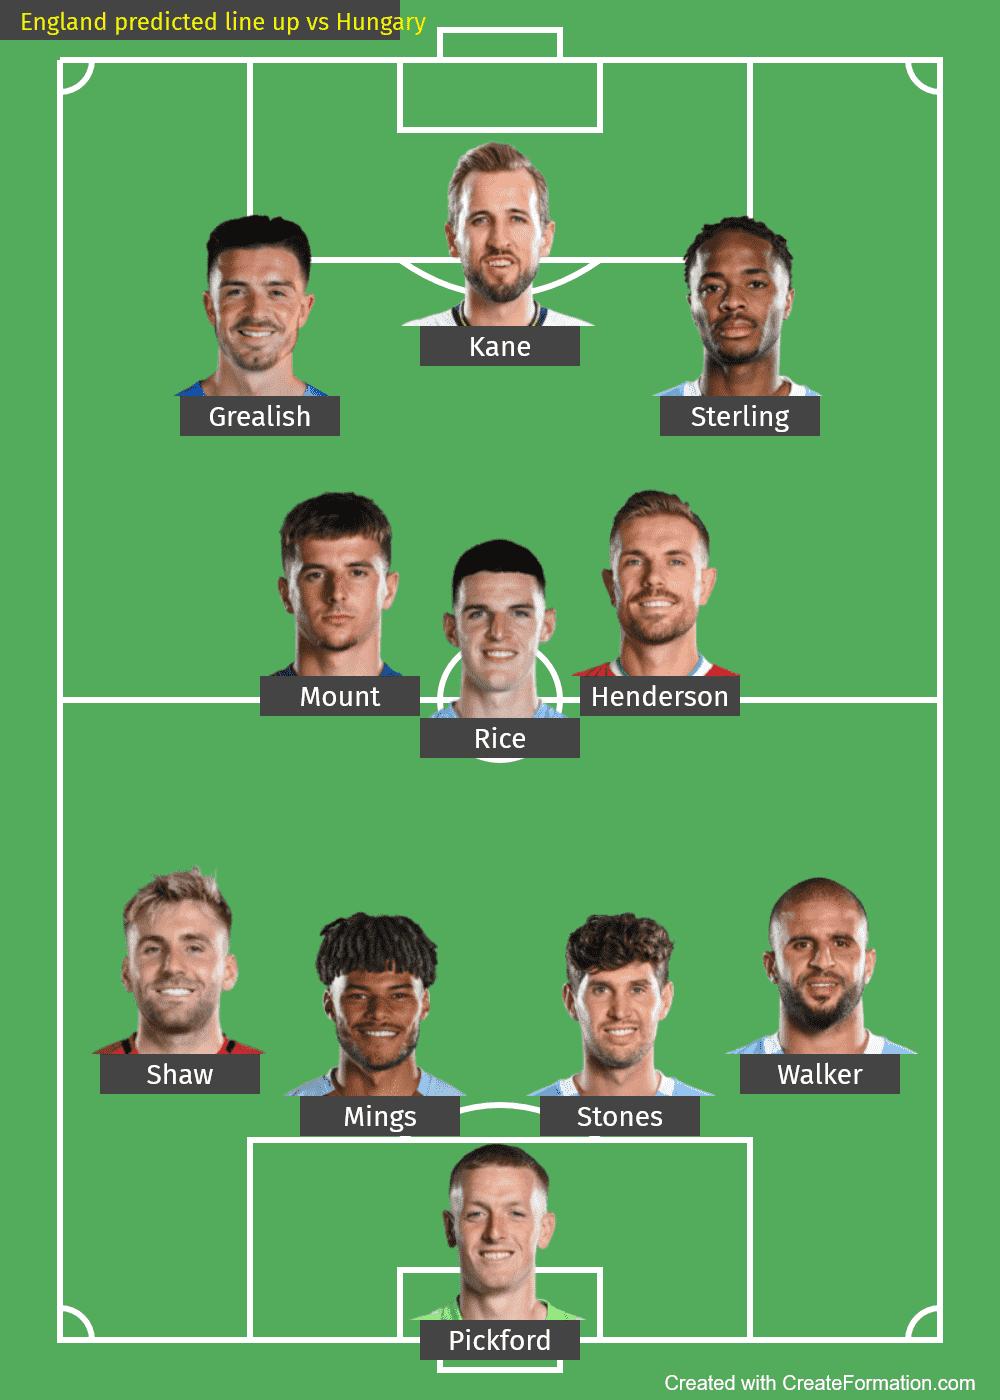 England predicted line up vs Hungary